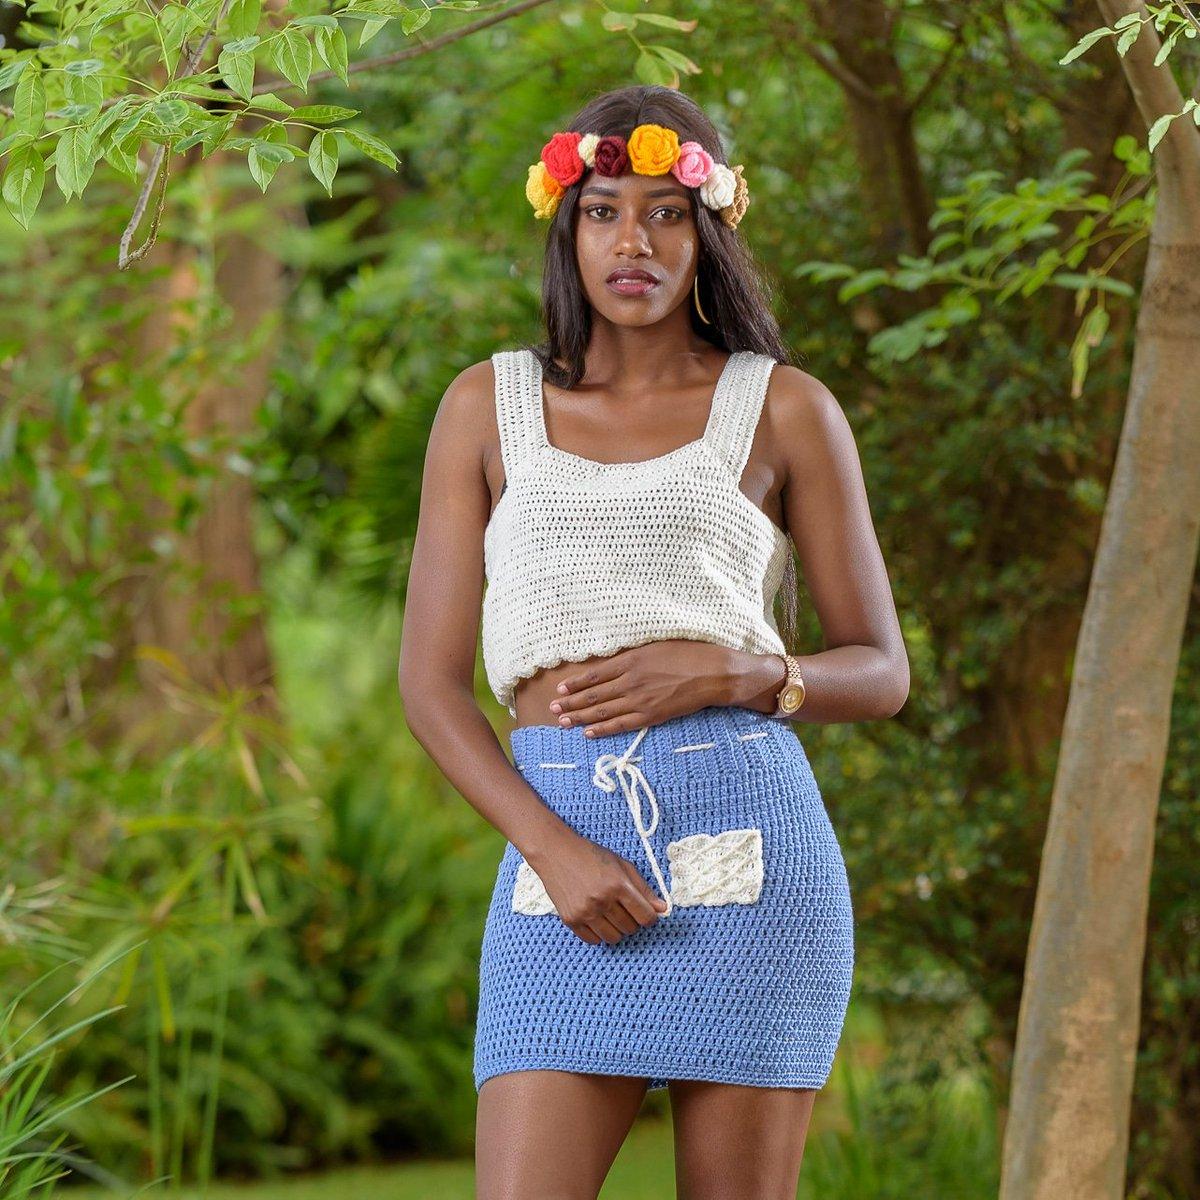 Petition to have a #mugarden video remake featuring #ellaapparel ? 😬 @winkydonline @gemmamusic_   Our model in a top to bottom ellaapparel crochet wear  #styling #fashion #fashionblogger #crochet #flowercrown #crochettop #crochetskirt #crochetaddict  #handmade   📷 @munyatsunga